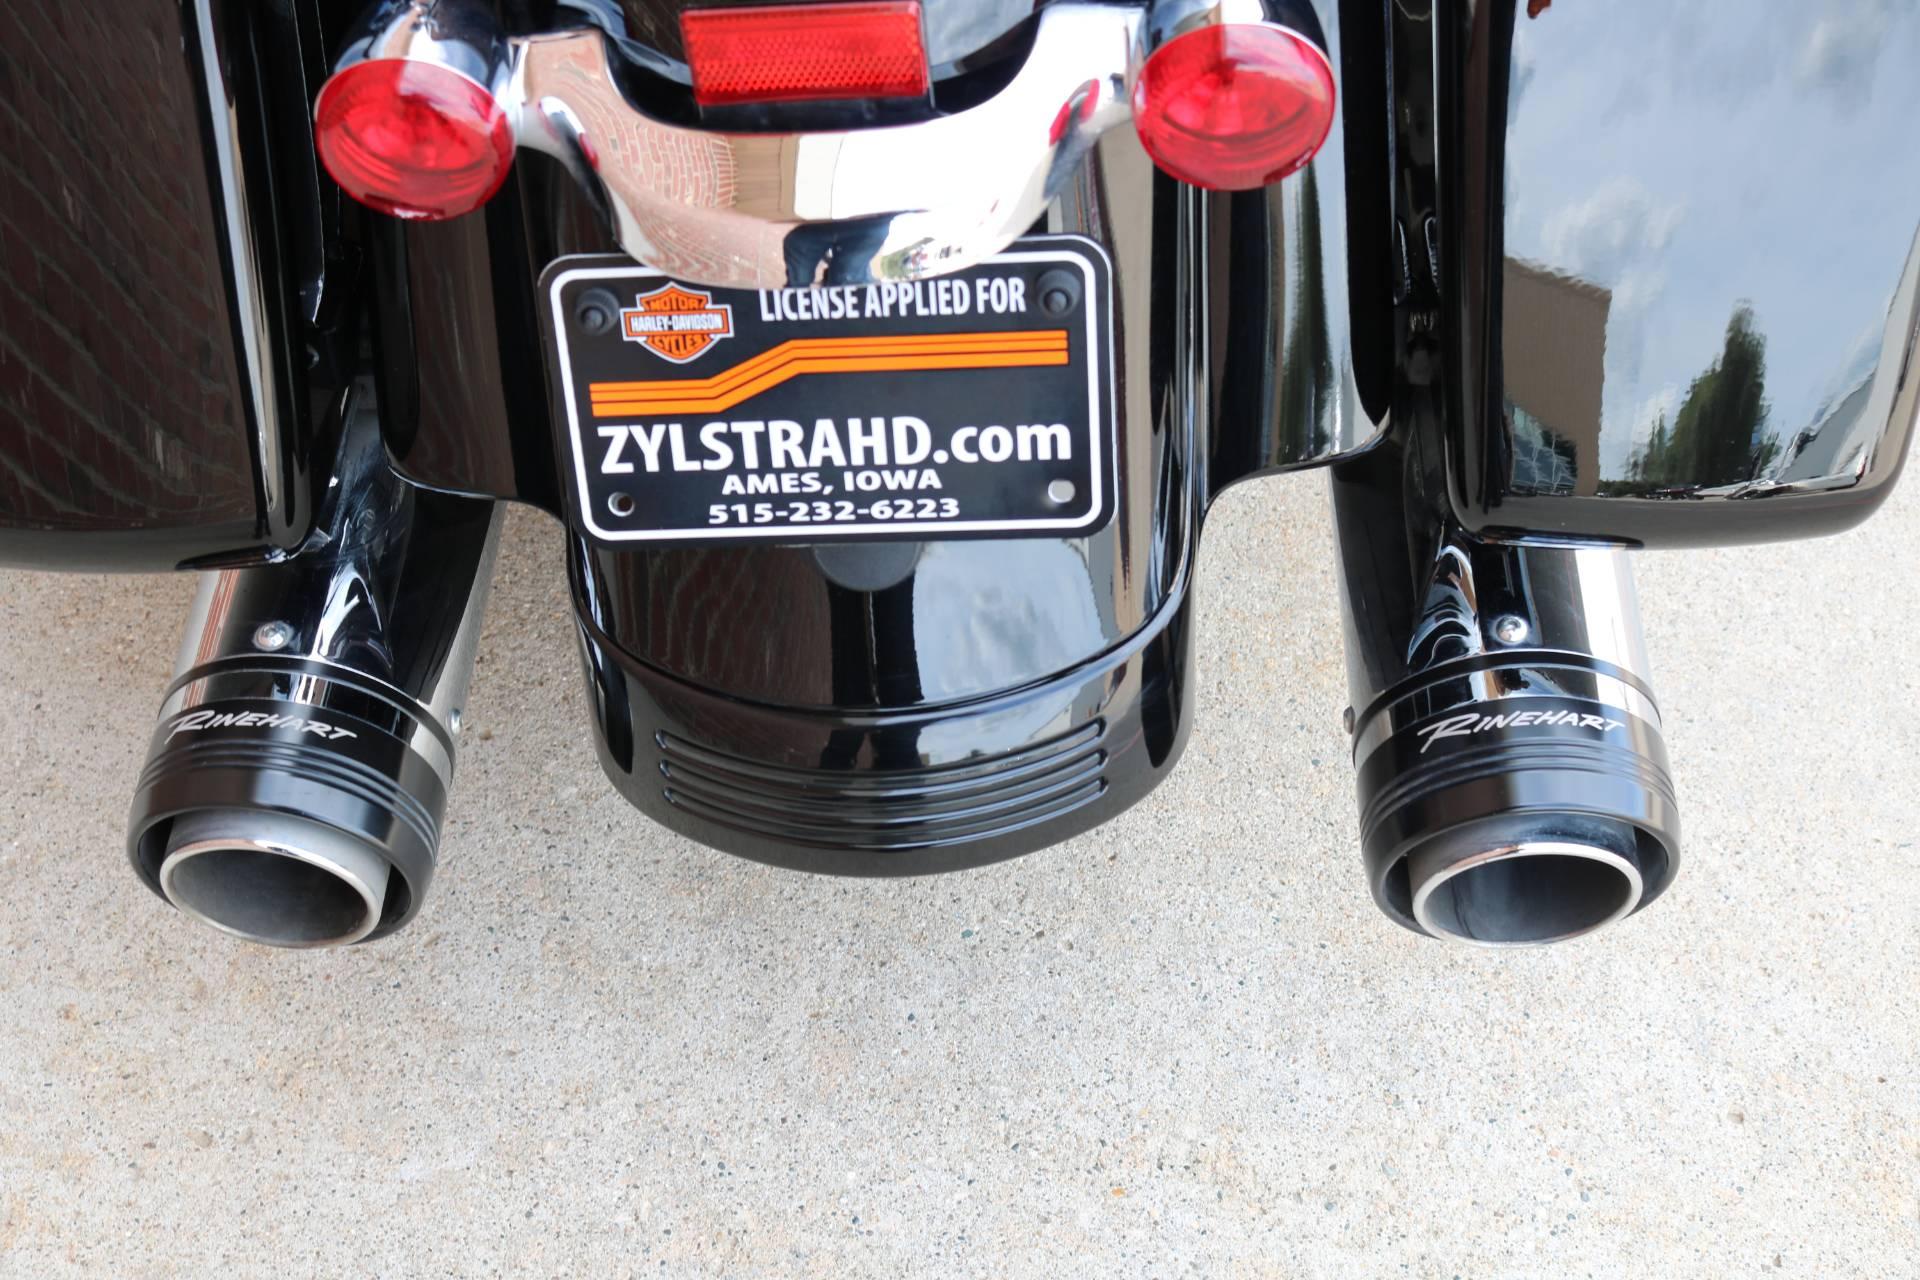 2017 Harley-Davidson Street Glide® Special in Ames, Iowa